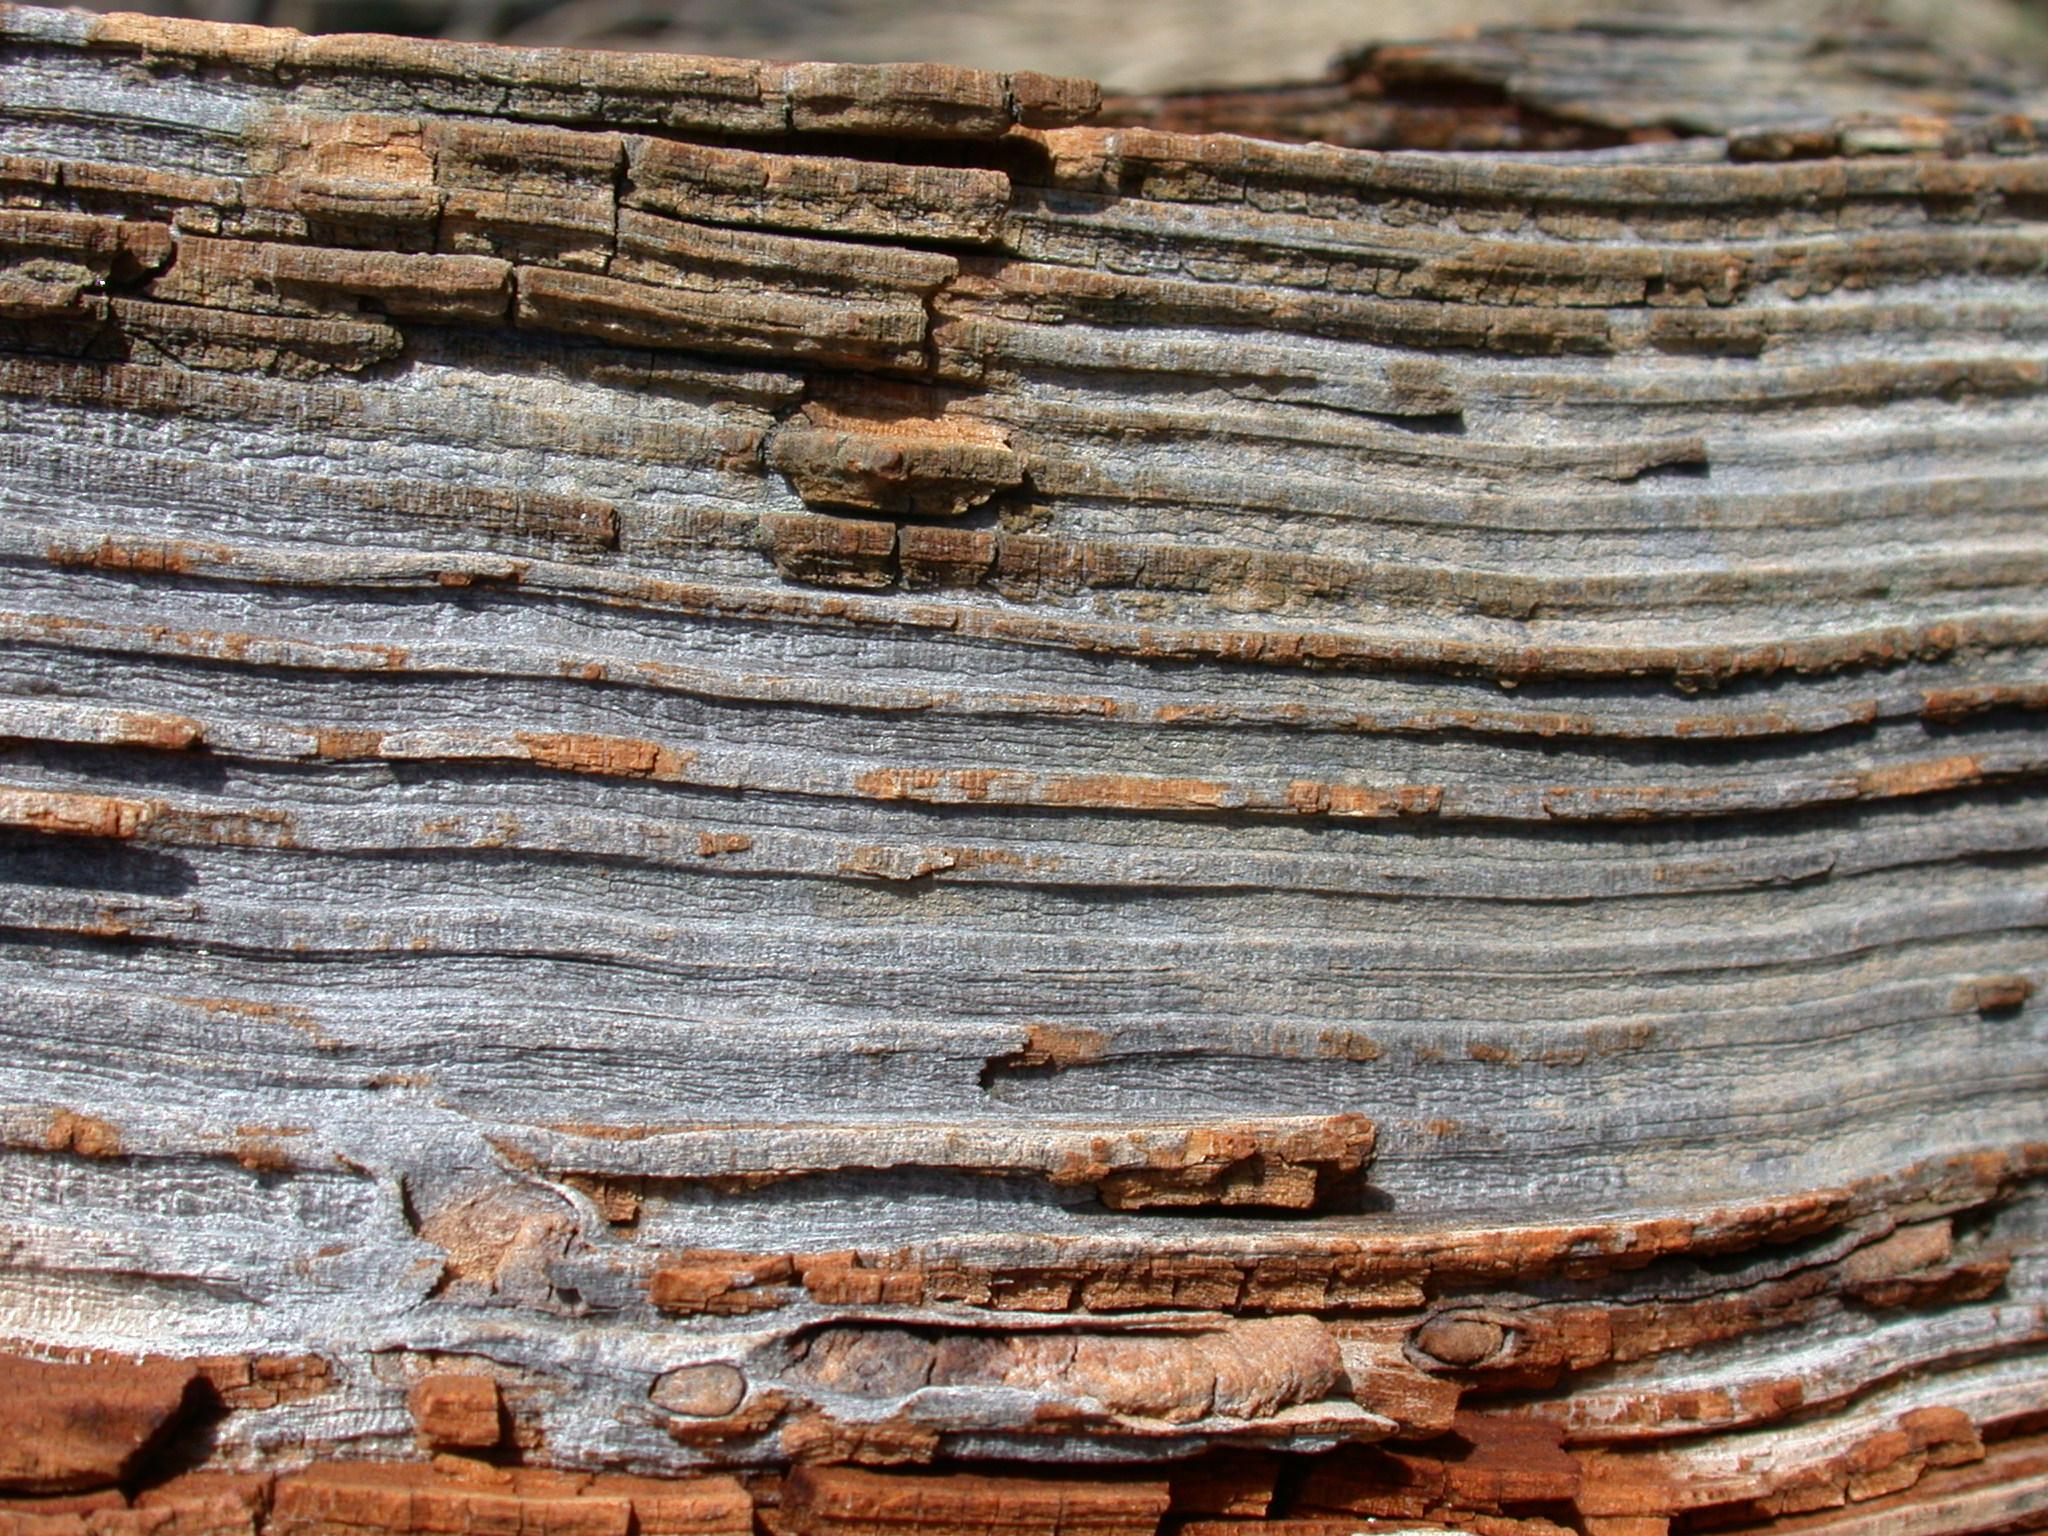 wood bark cut-thru layer layered layers horizontal plane lines